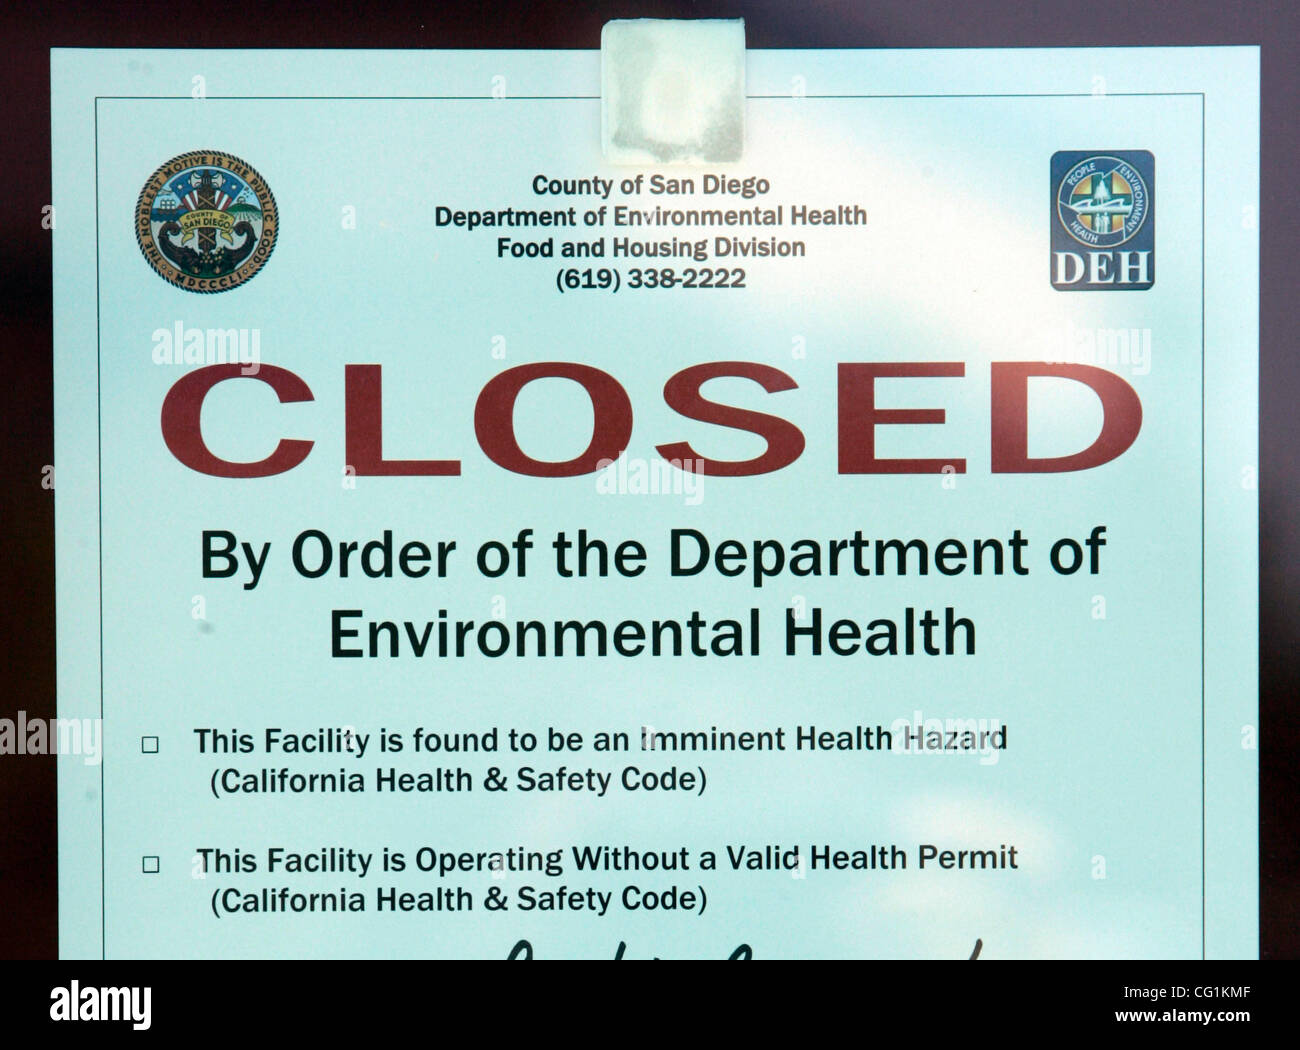 San Diego Health Department >> Hlbadwaterotay276484x004 Jpg 8 21 2007 Chula Vista San